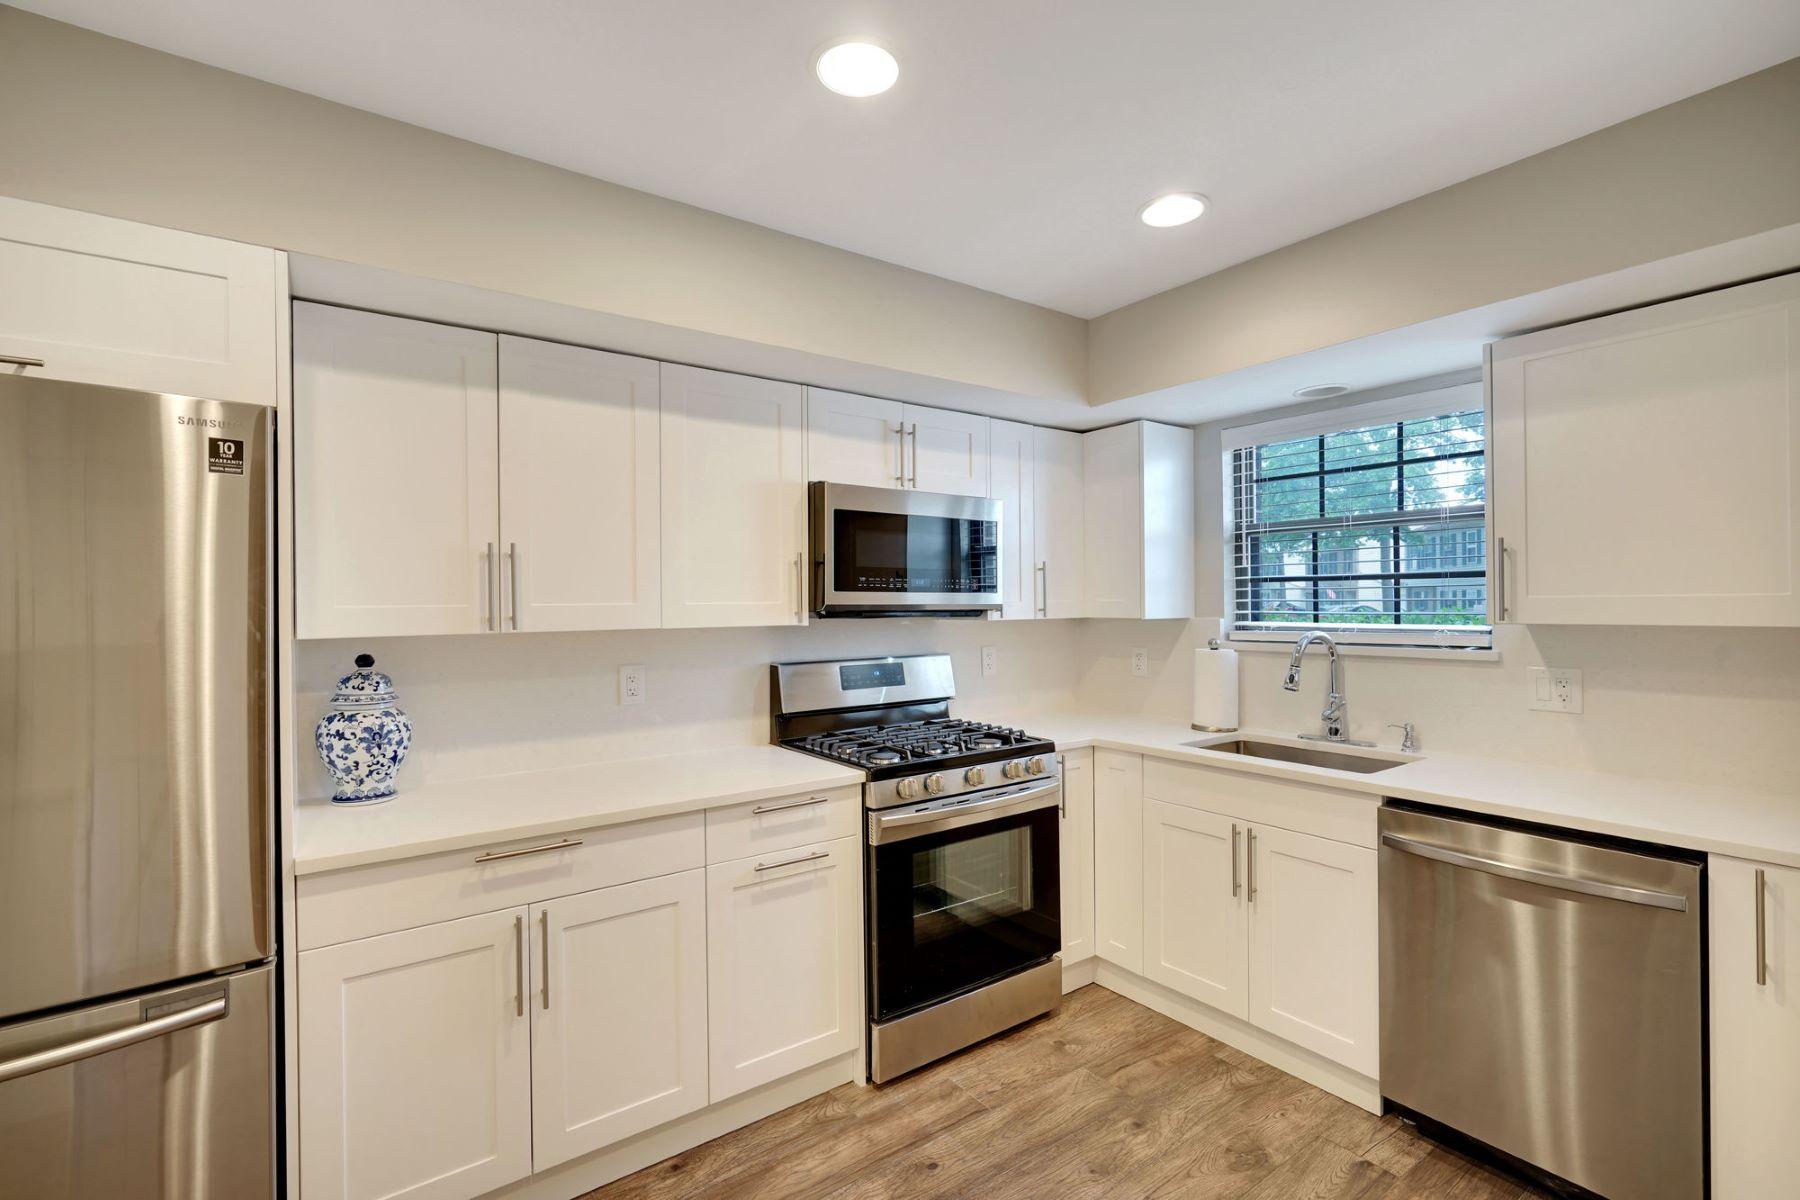 Condominiums για την Πώληση στο Fairway Mews Raising the Bar 47 Apple Drive, Spring Lake, Νιου Τζερσεϋ 07762 Ηνωμένες Πολιτείες